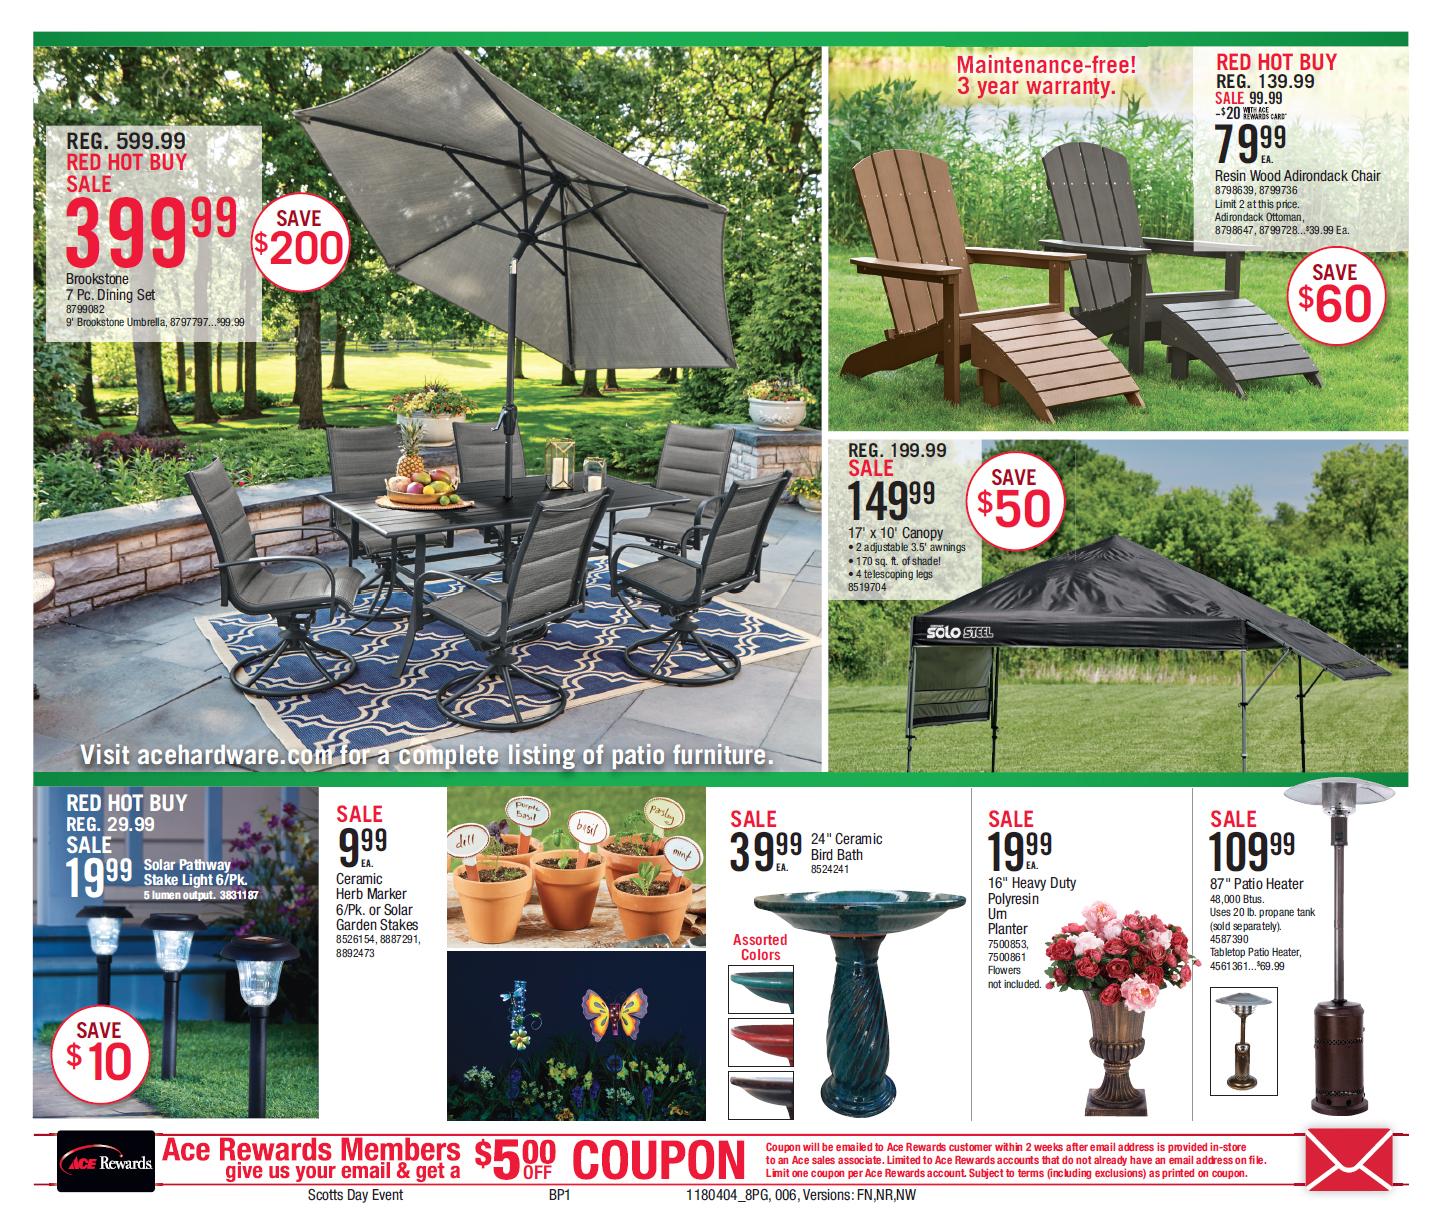 scotts days sale 6.jpg